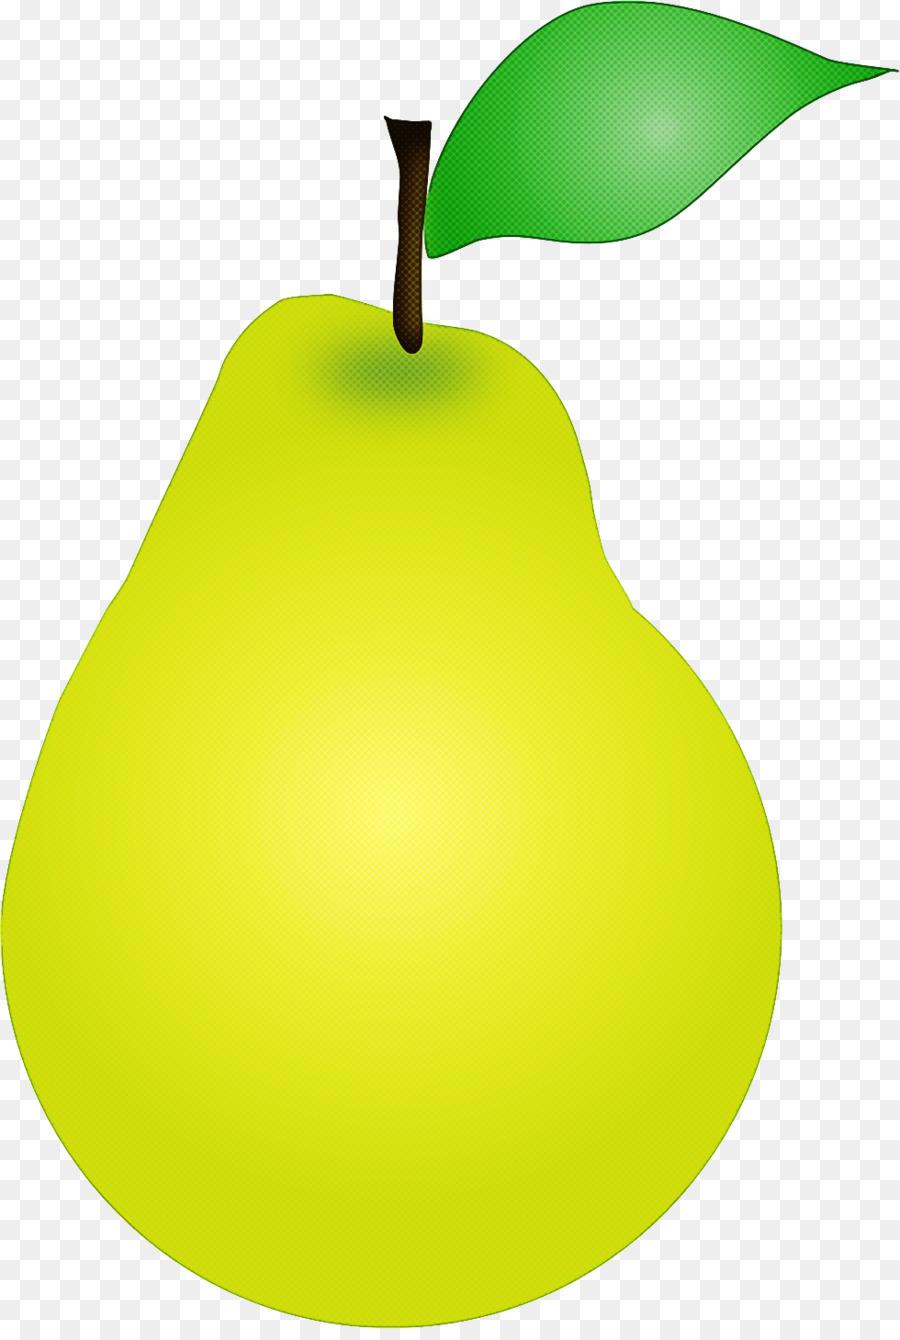 картинки зеленого груша тем многие люди